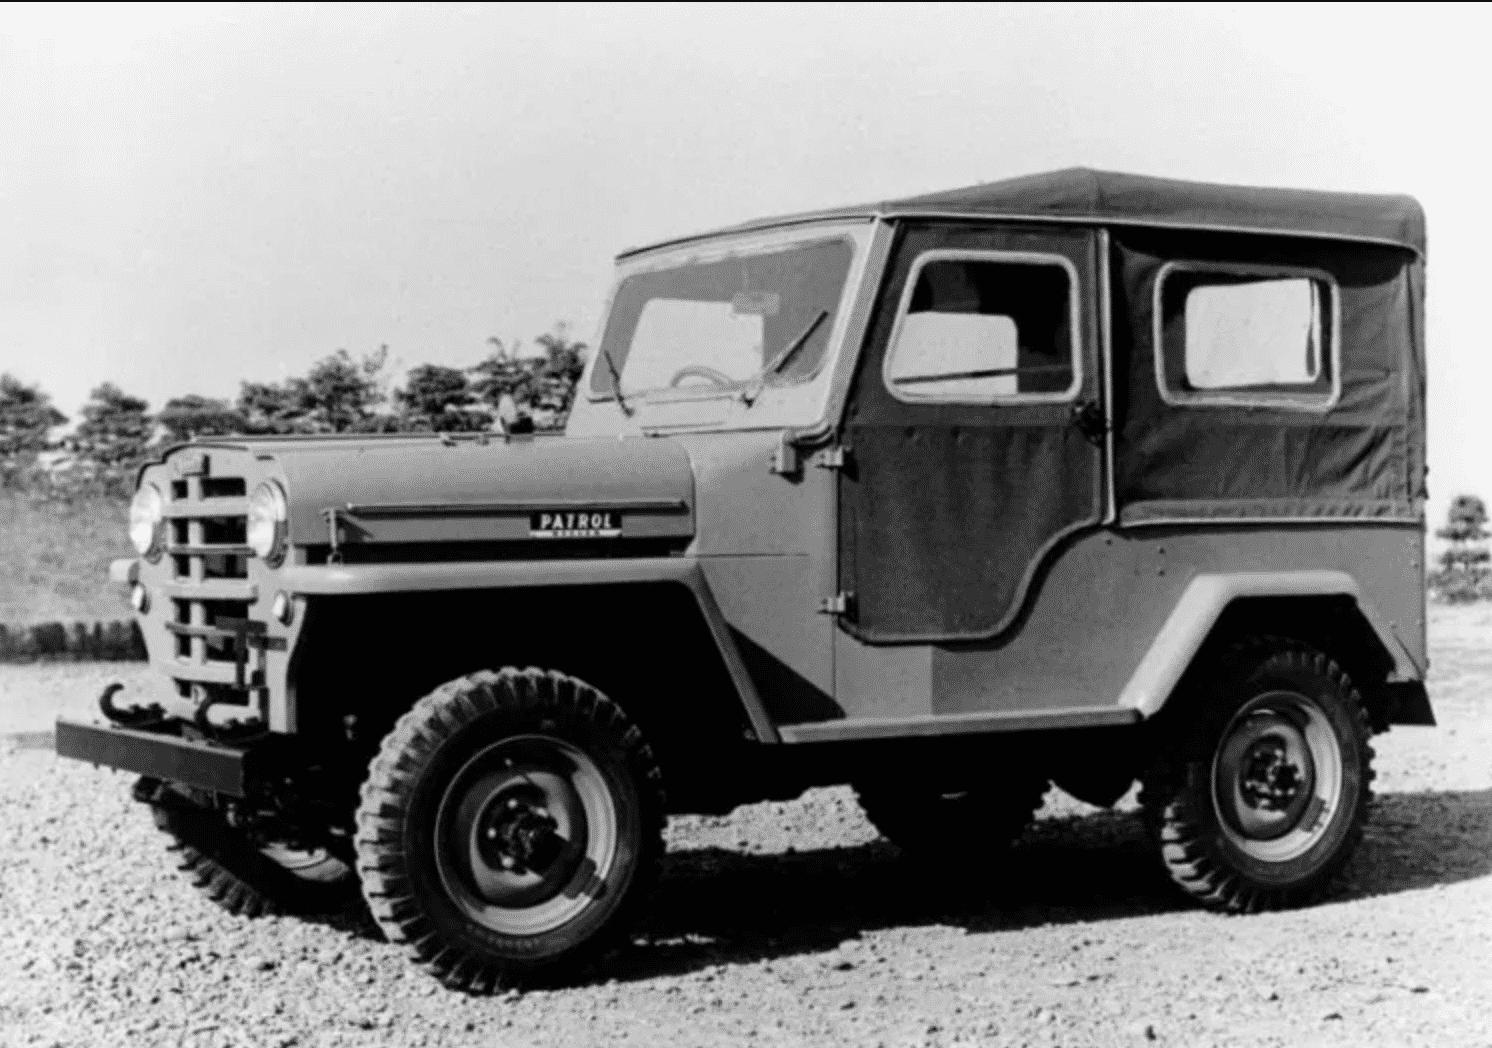 Nissan Patrol First Generation